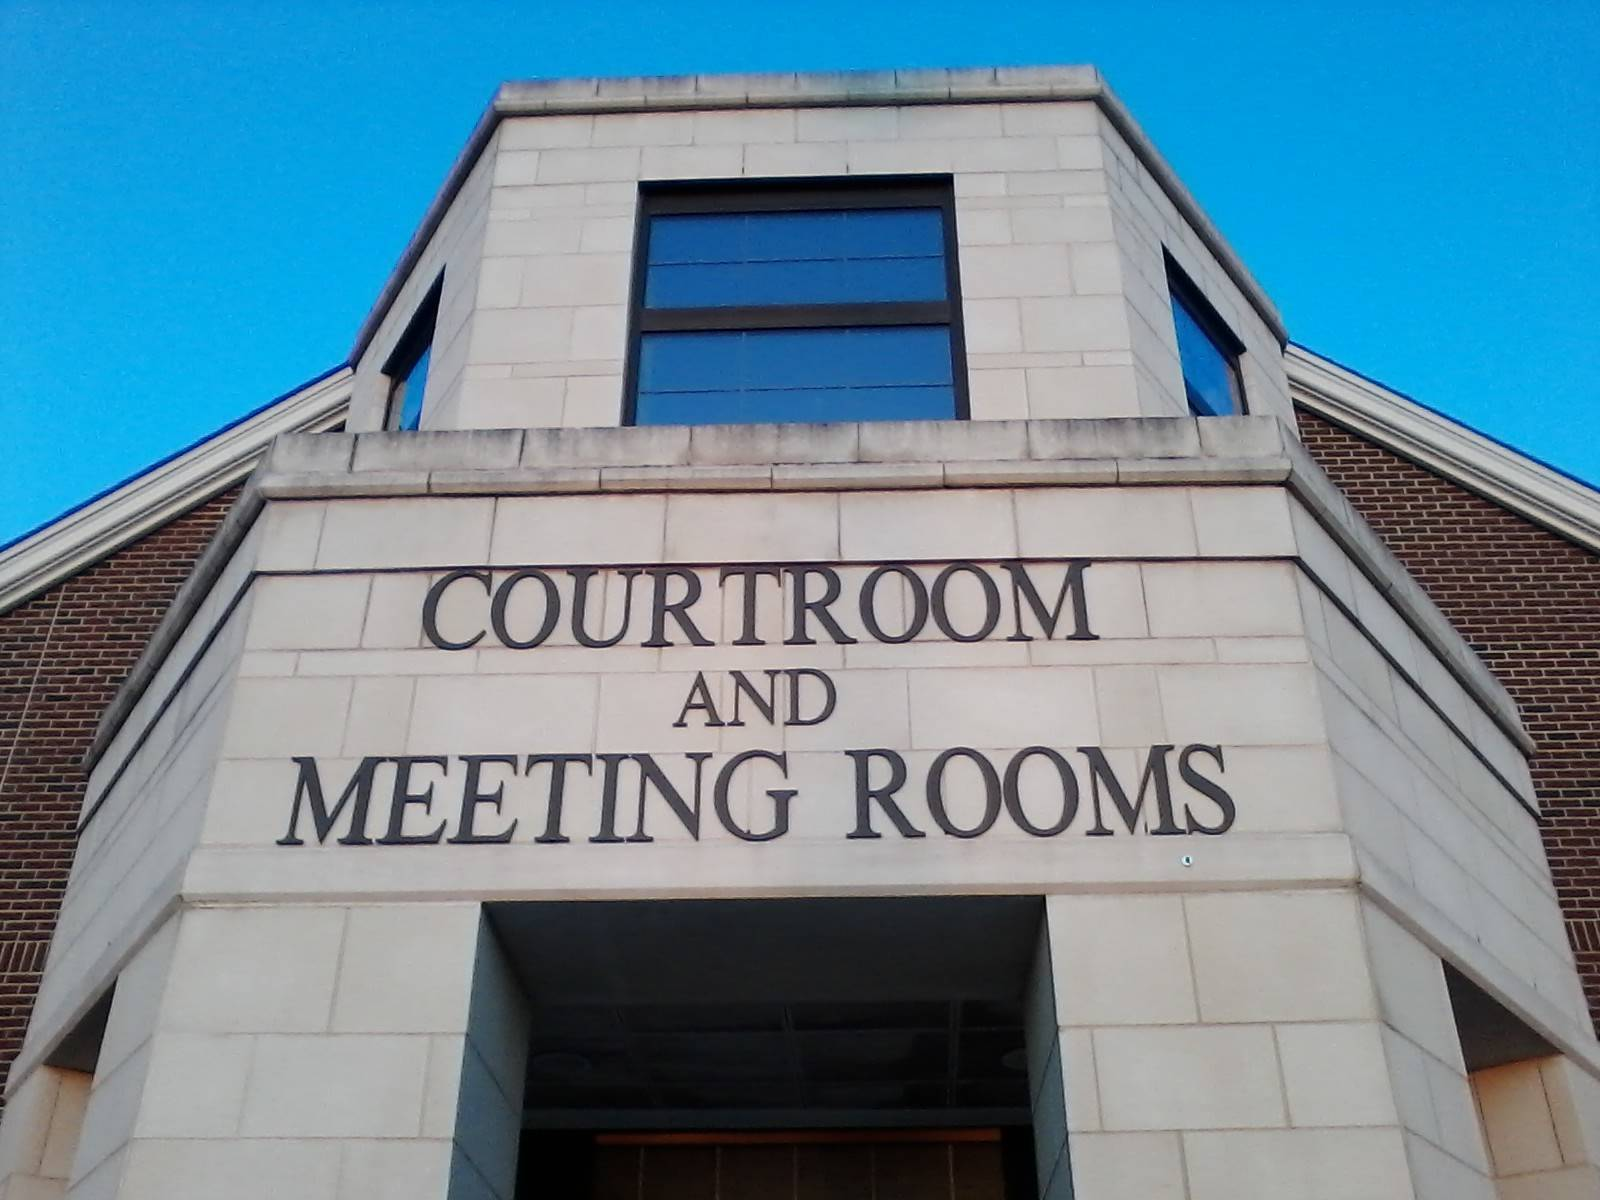 8ad527c8867ce6432eaf_bridgewater_courtroom.jpg